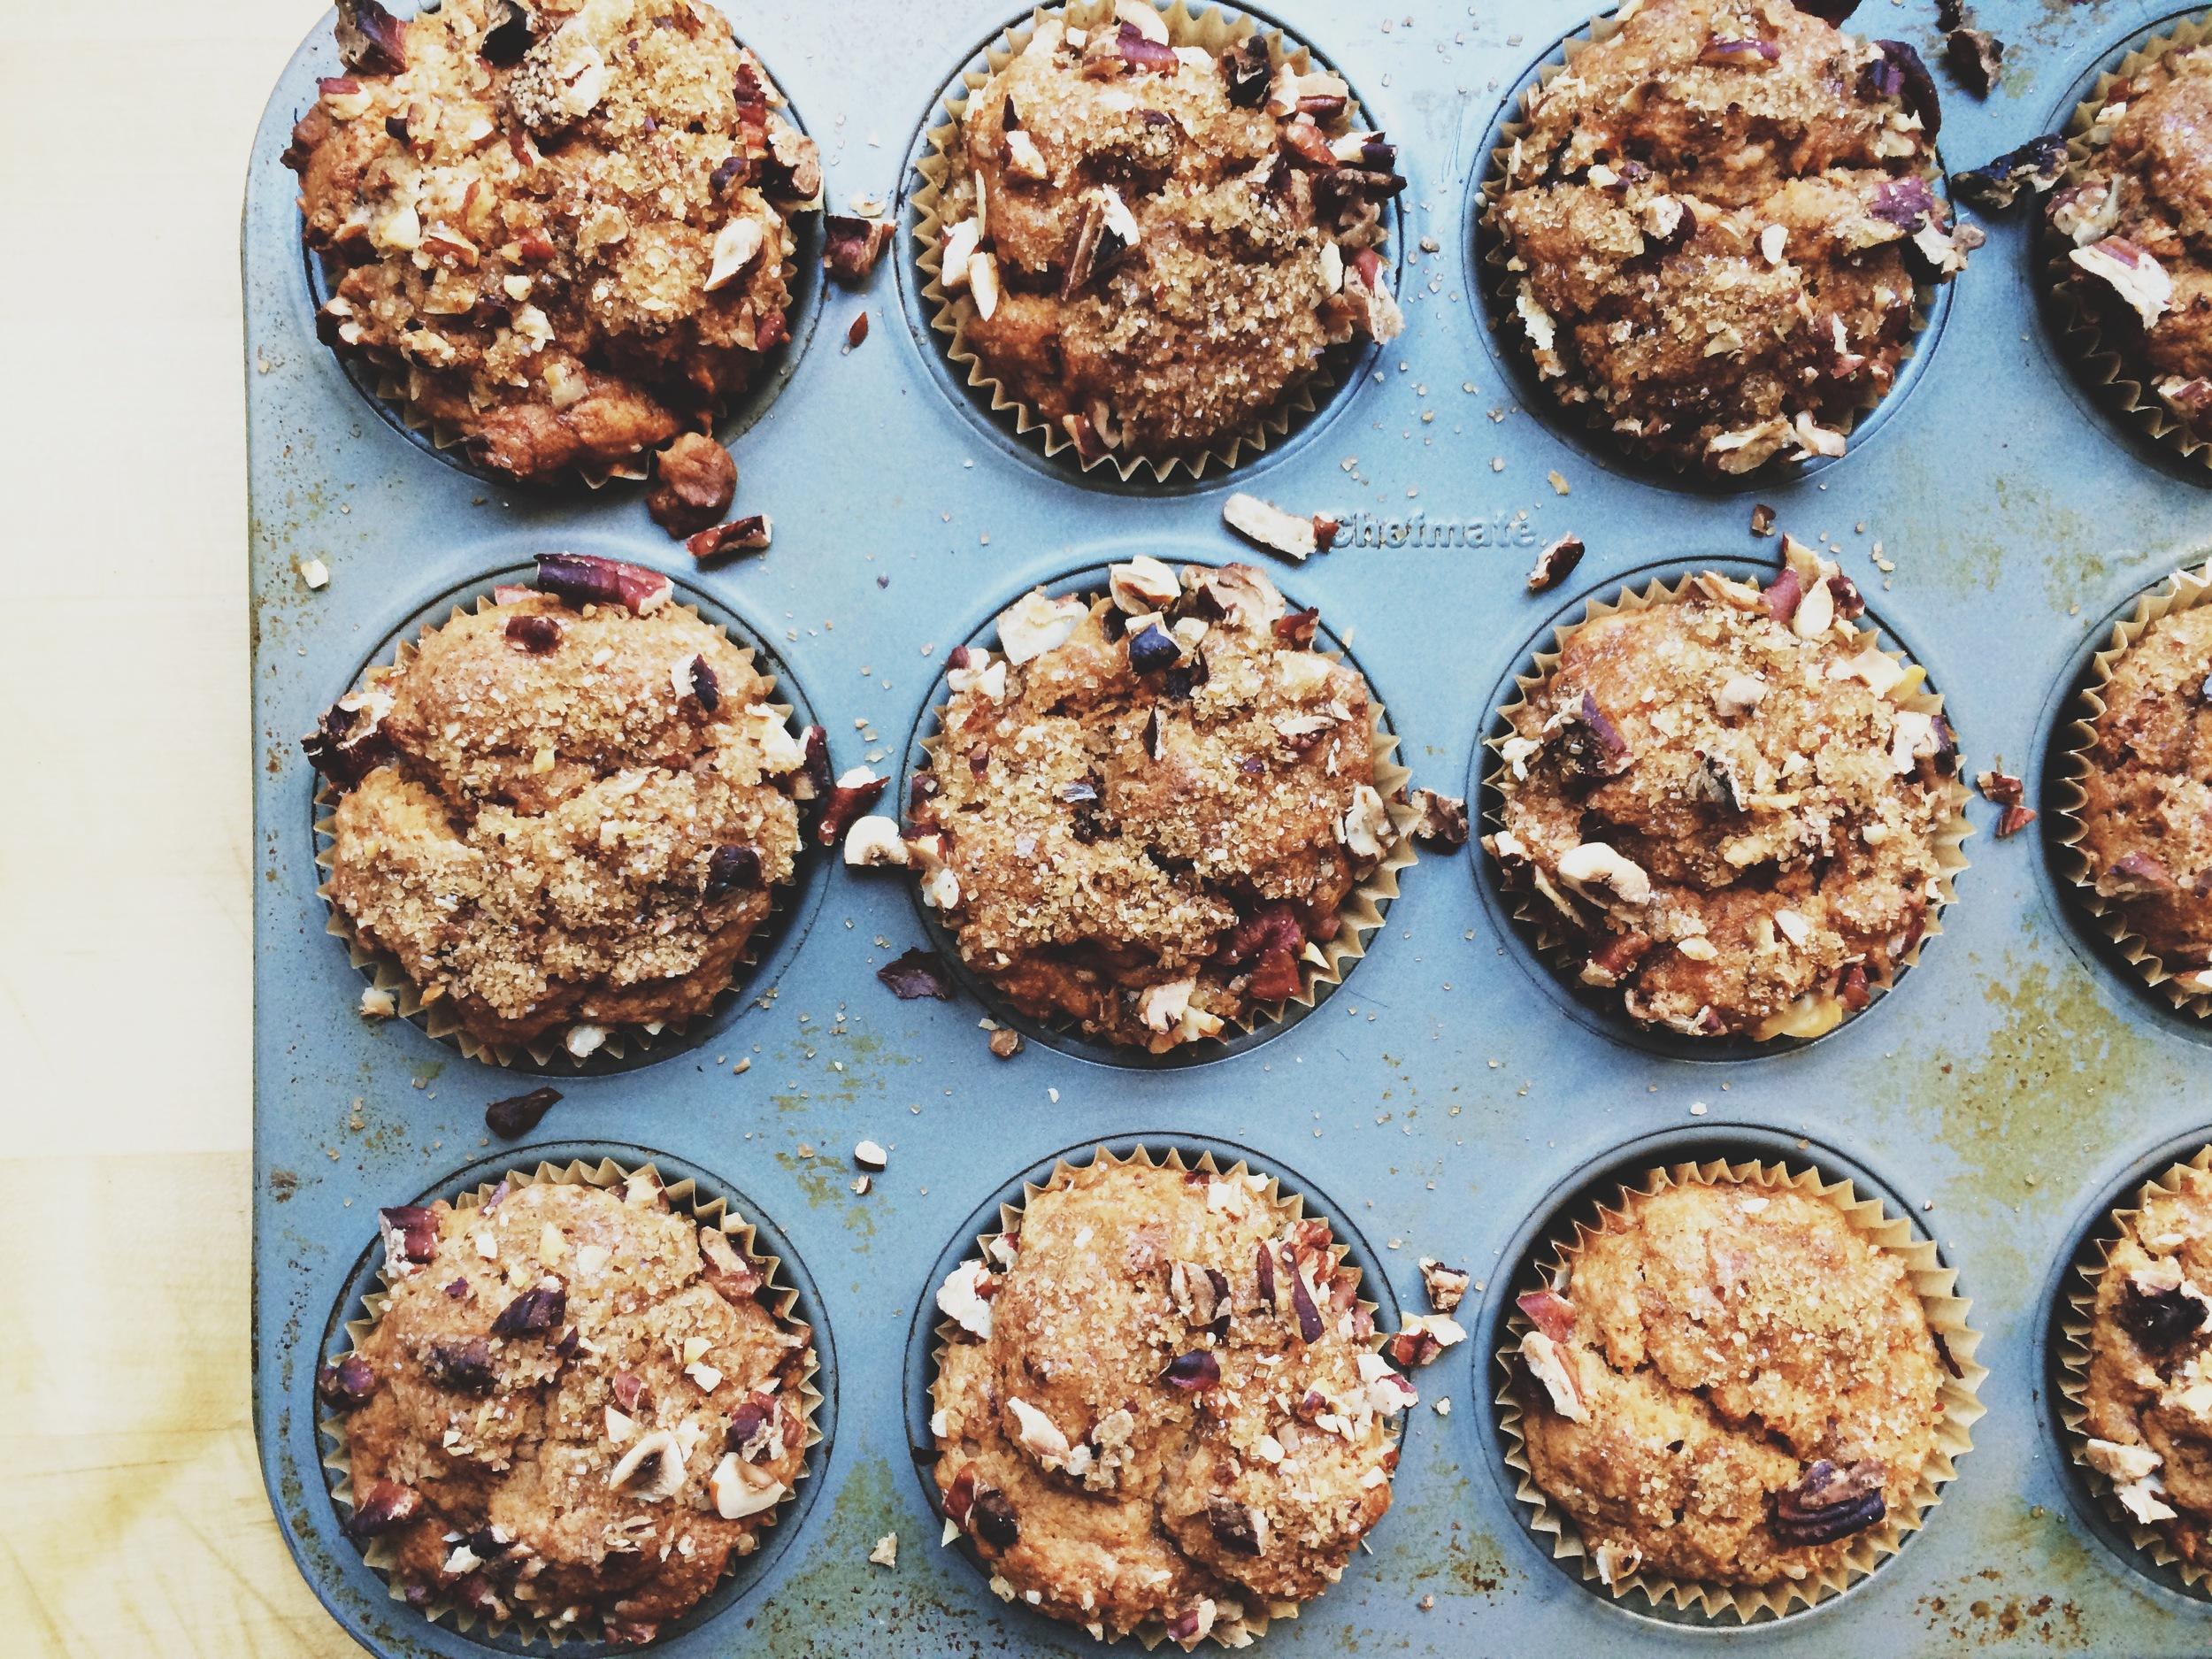 Sweet Potato Muffins | Eat This Poem